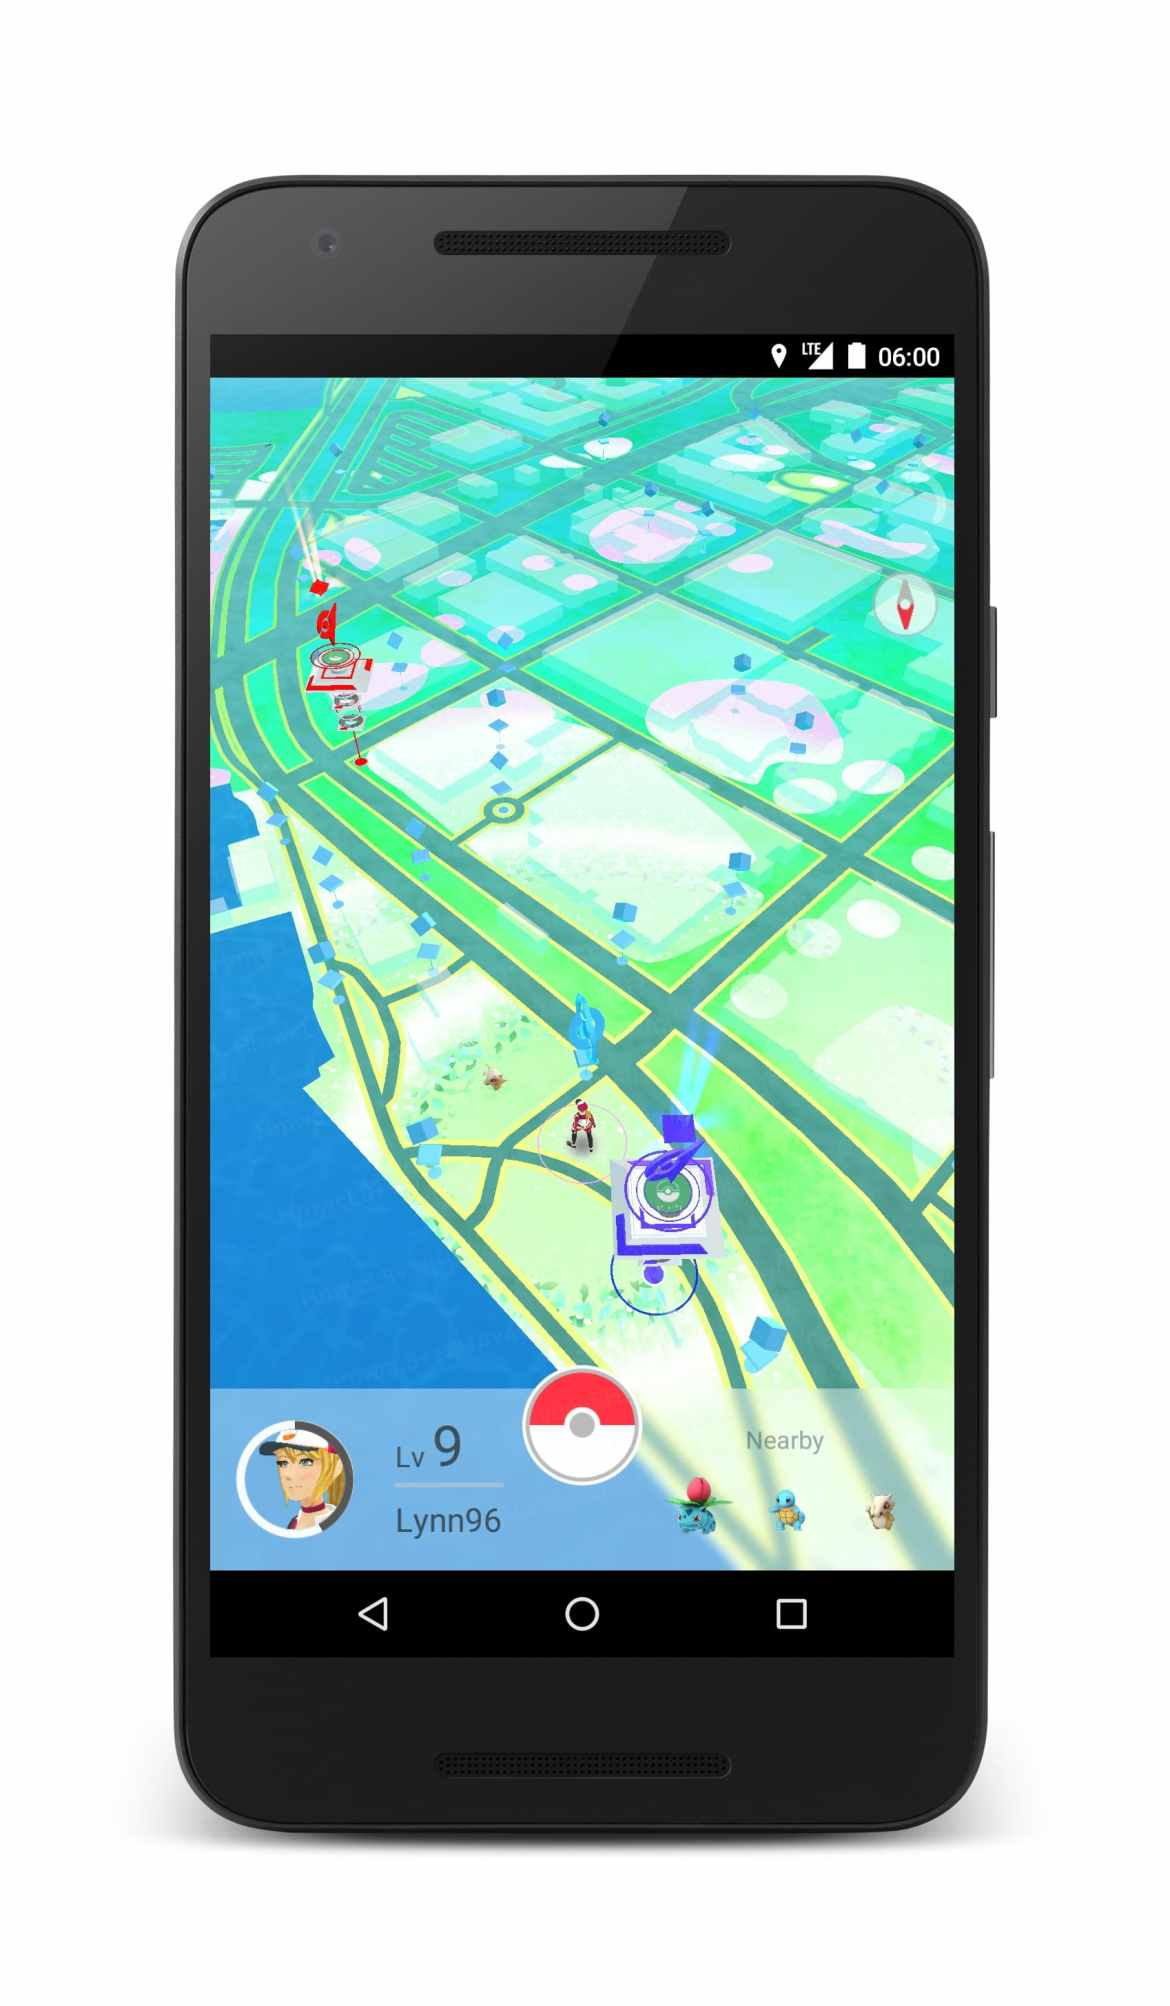 pokemon-go-map-view-screenshot-1